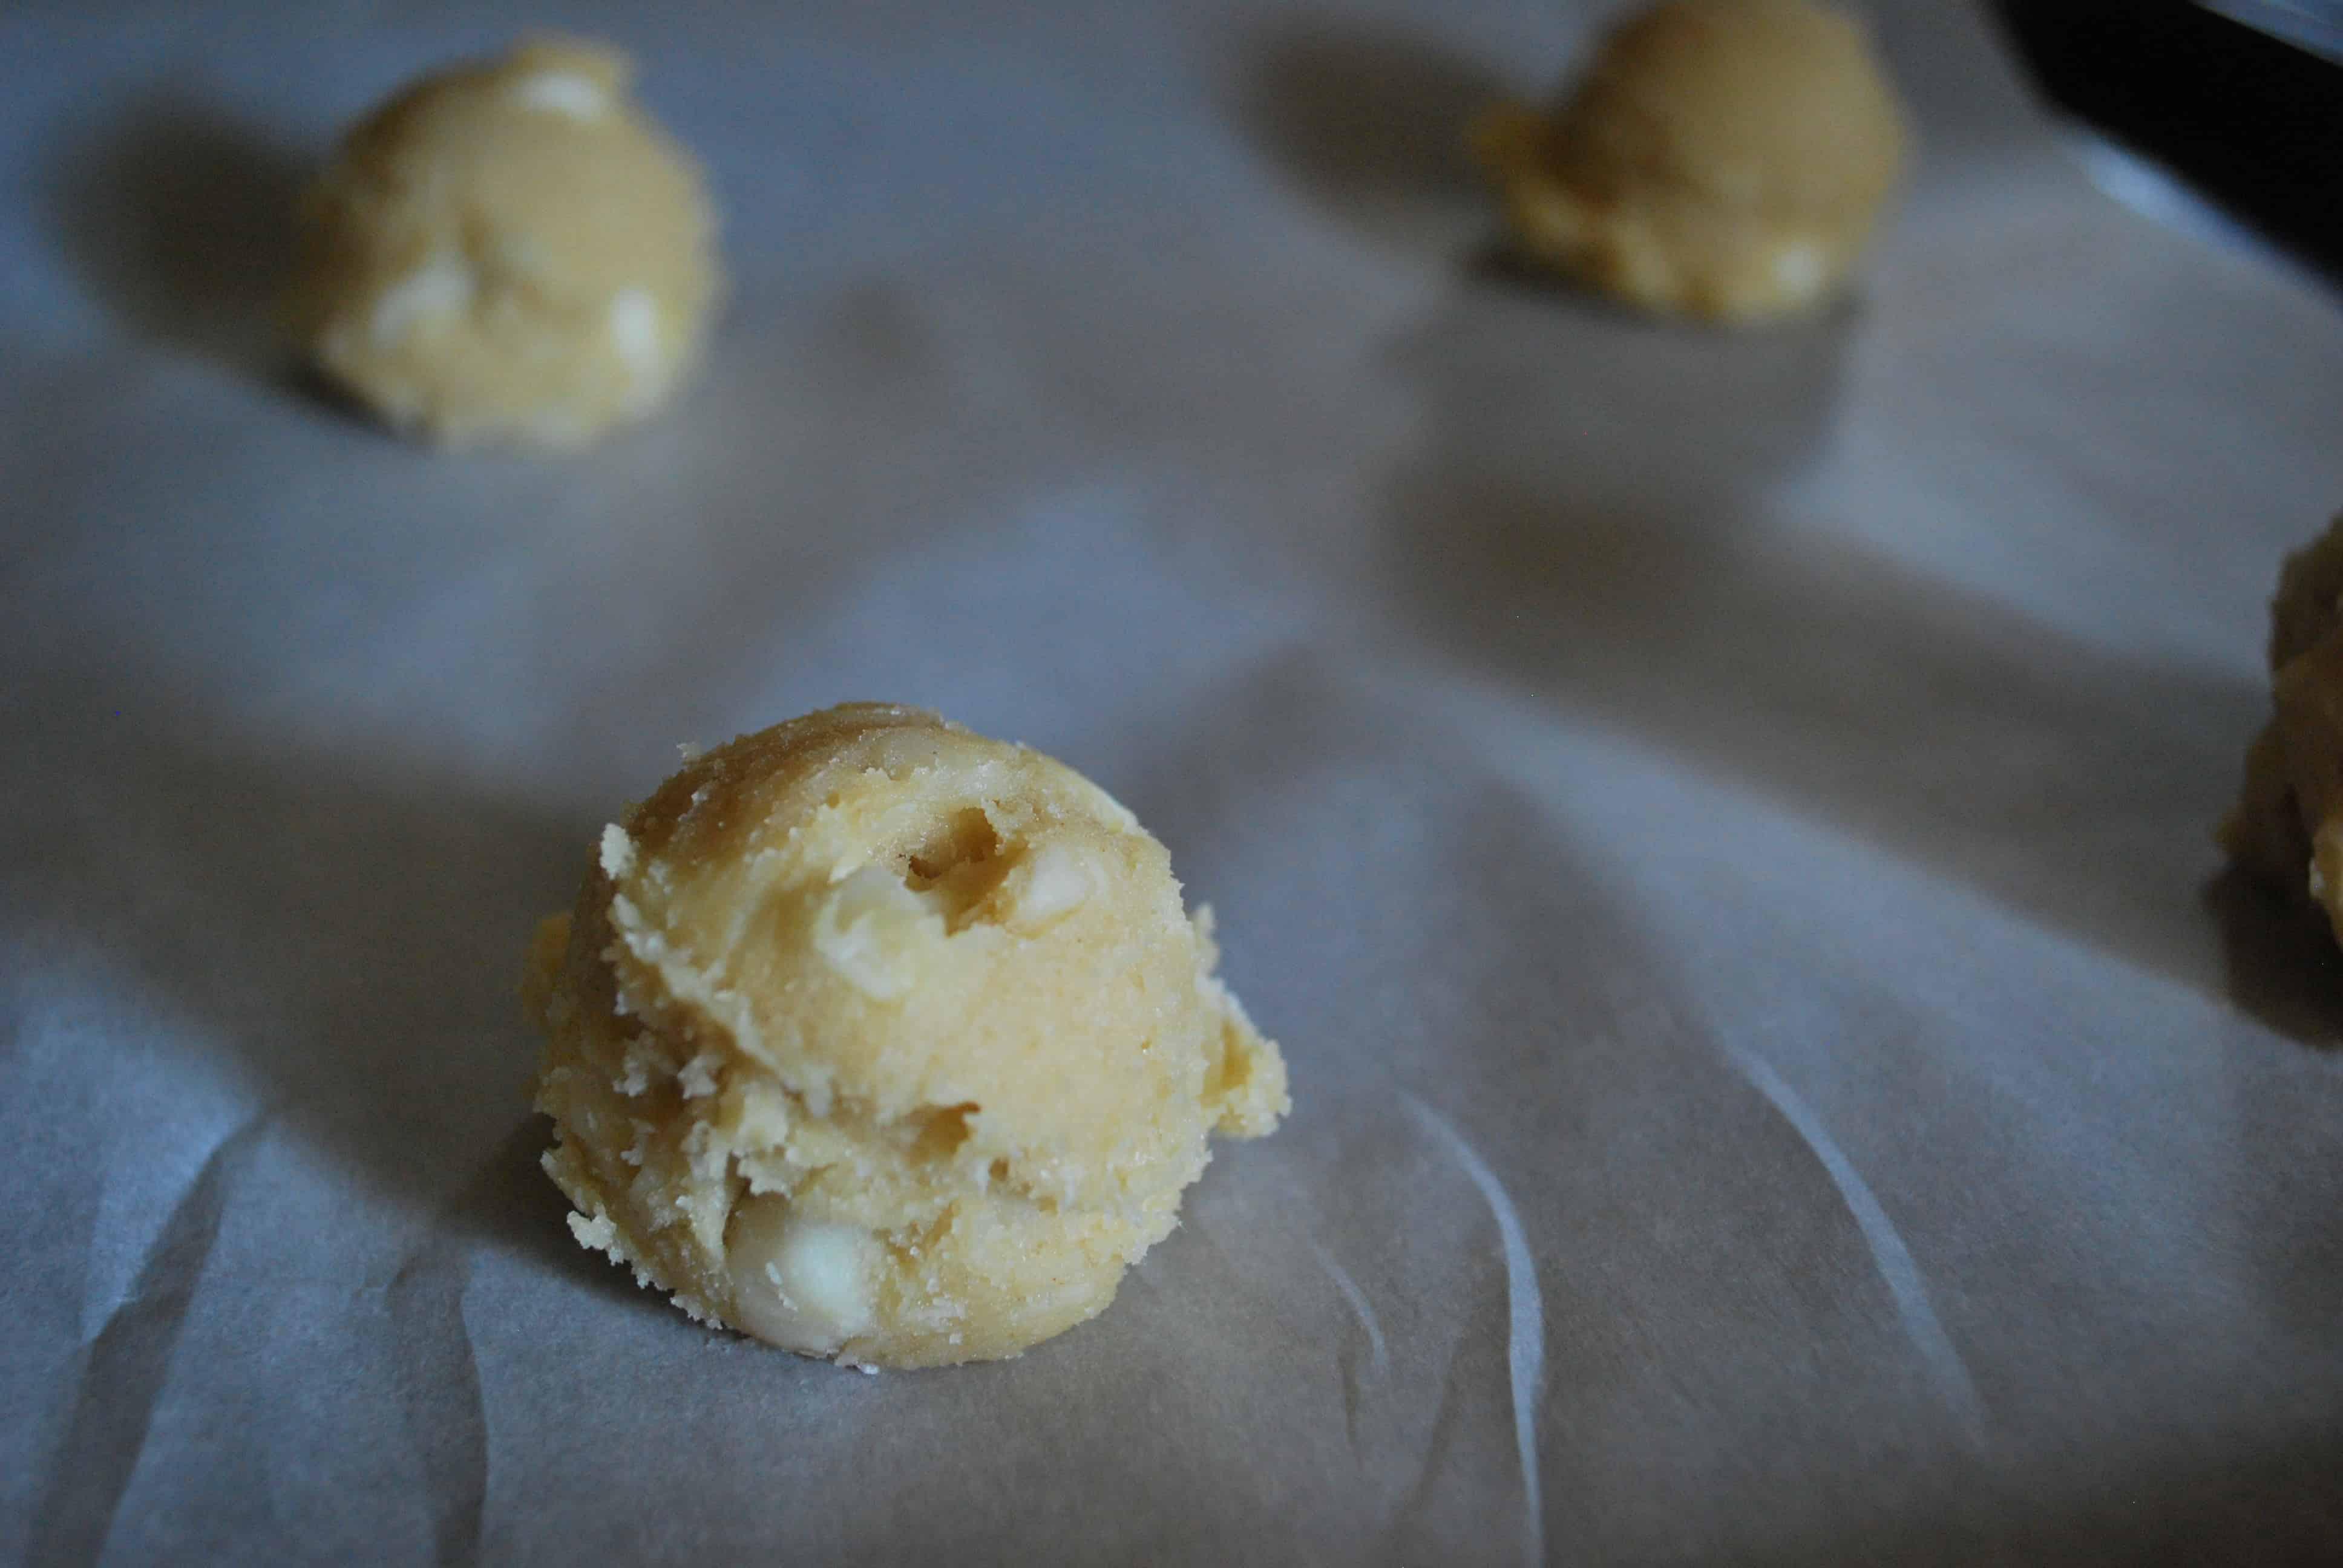 White Chocolate Chip Macadamia Nut Cookie Dough Balls